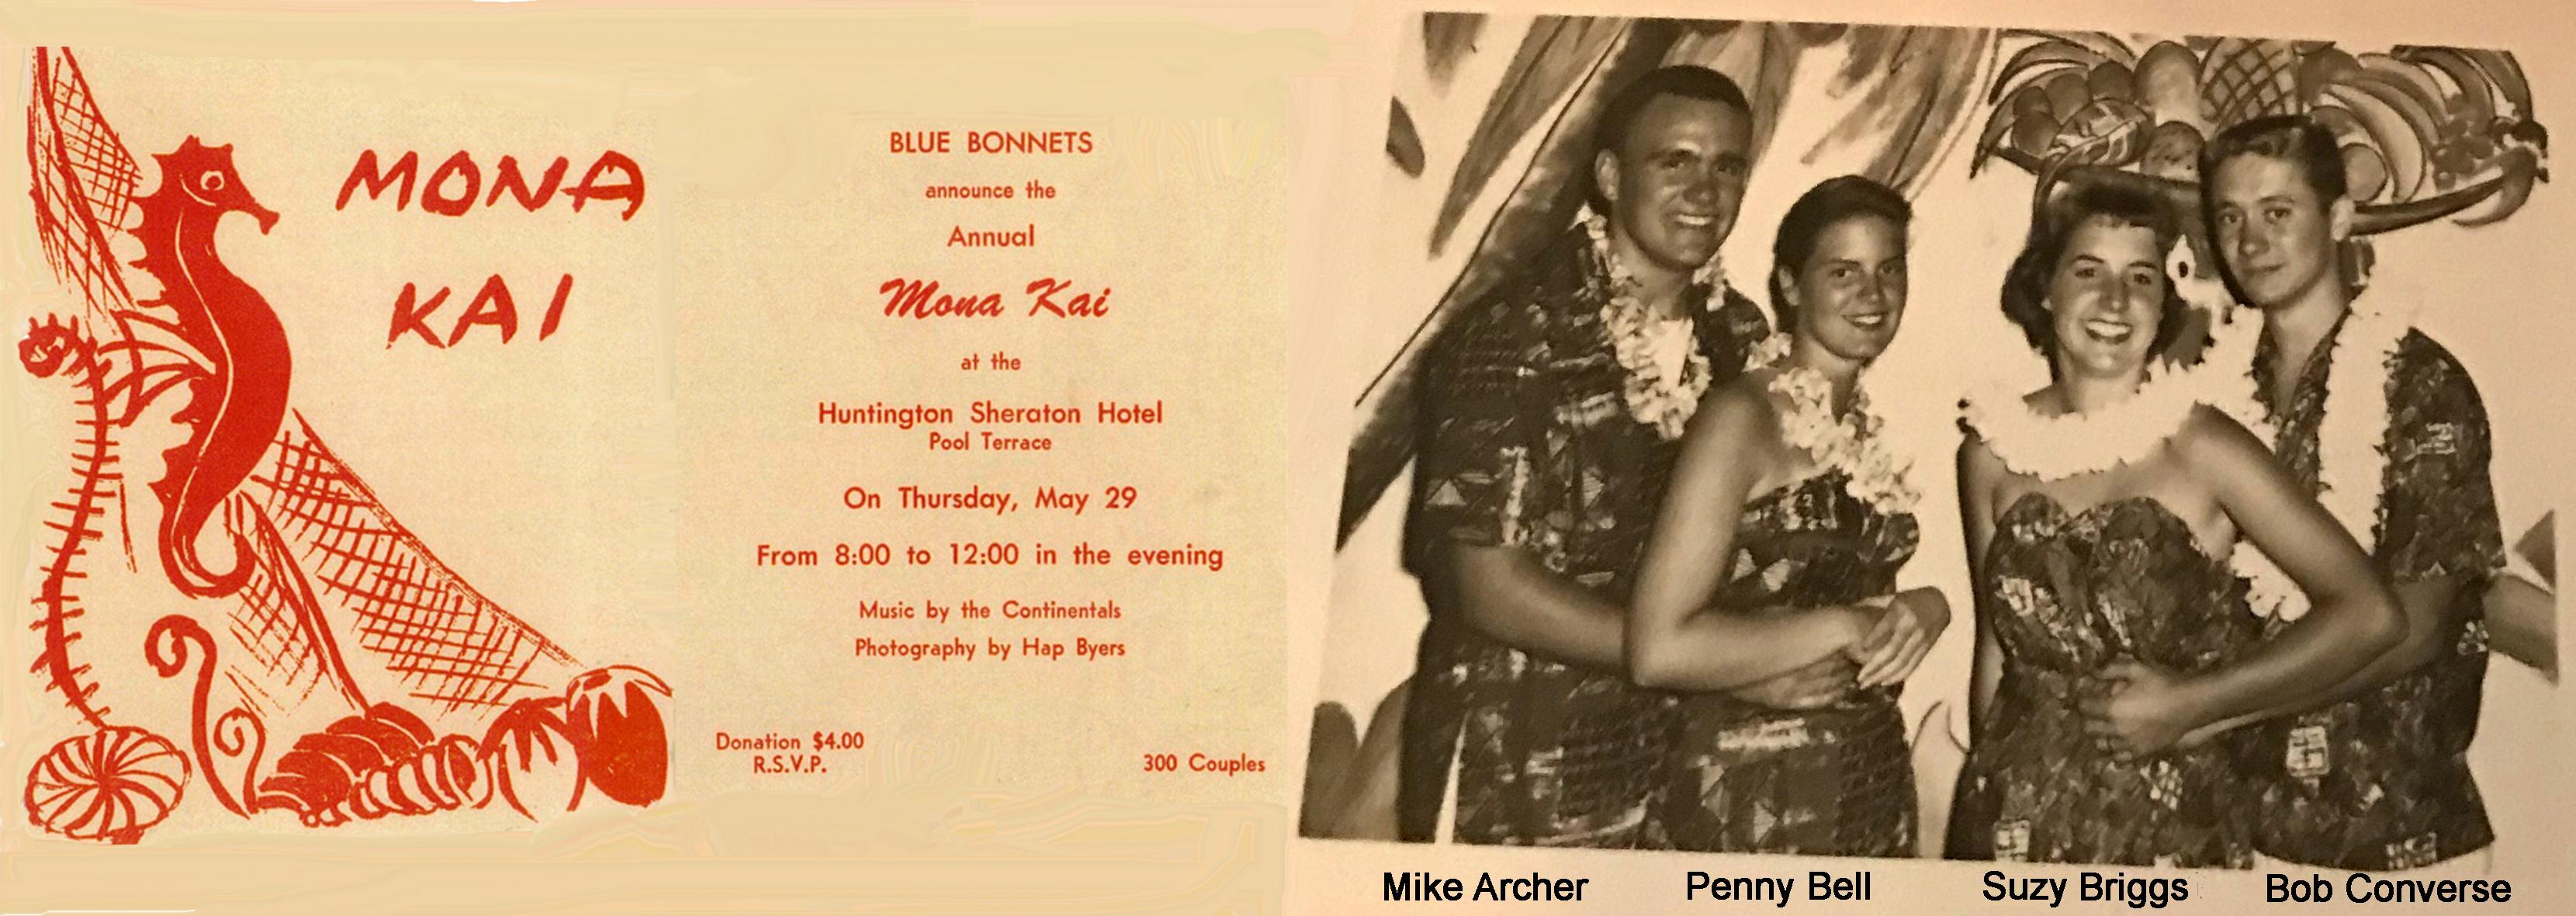 Mona Kai Invite 1958